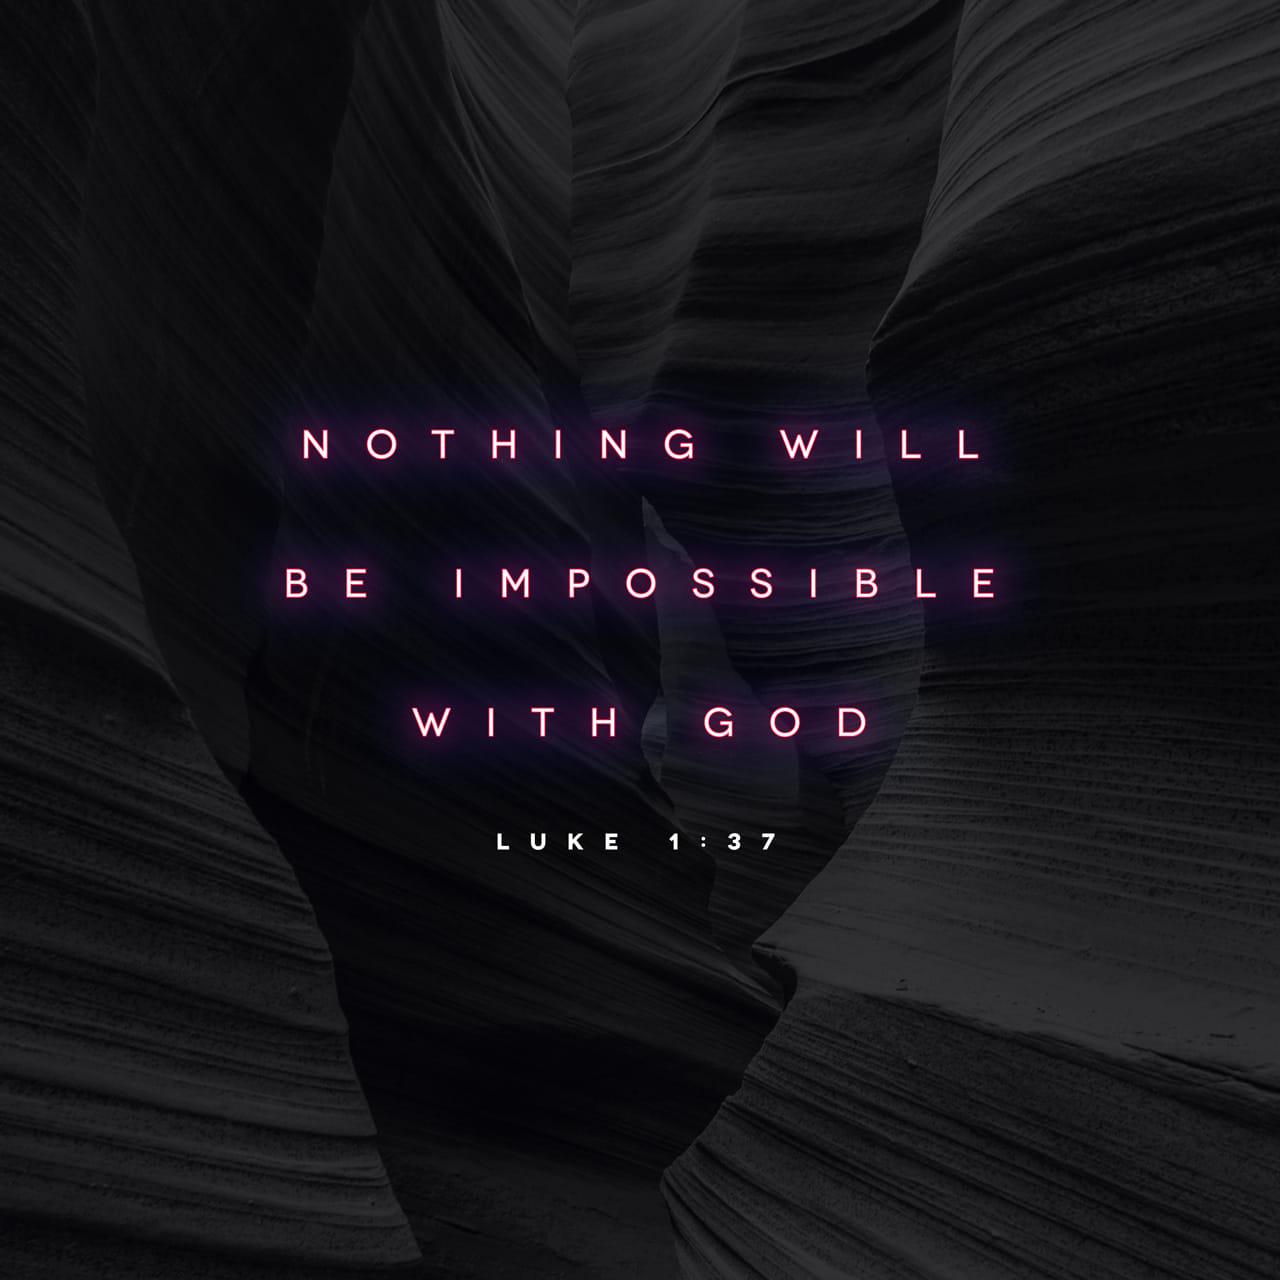 S. Lucas 1:37 porque nada hay imposible para Dios. | Biblia Reina Valera 1960 (RVR1960)